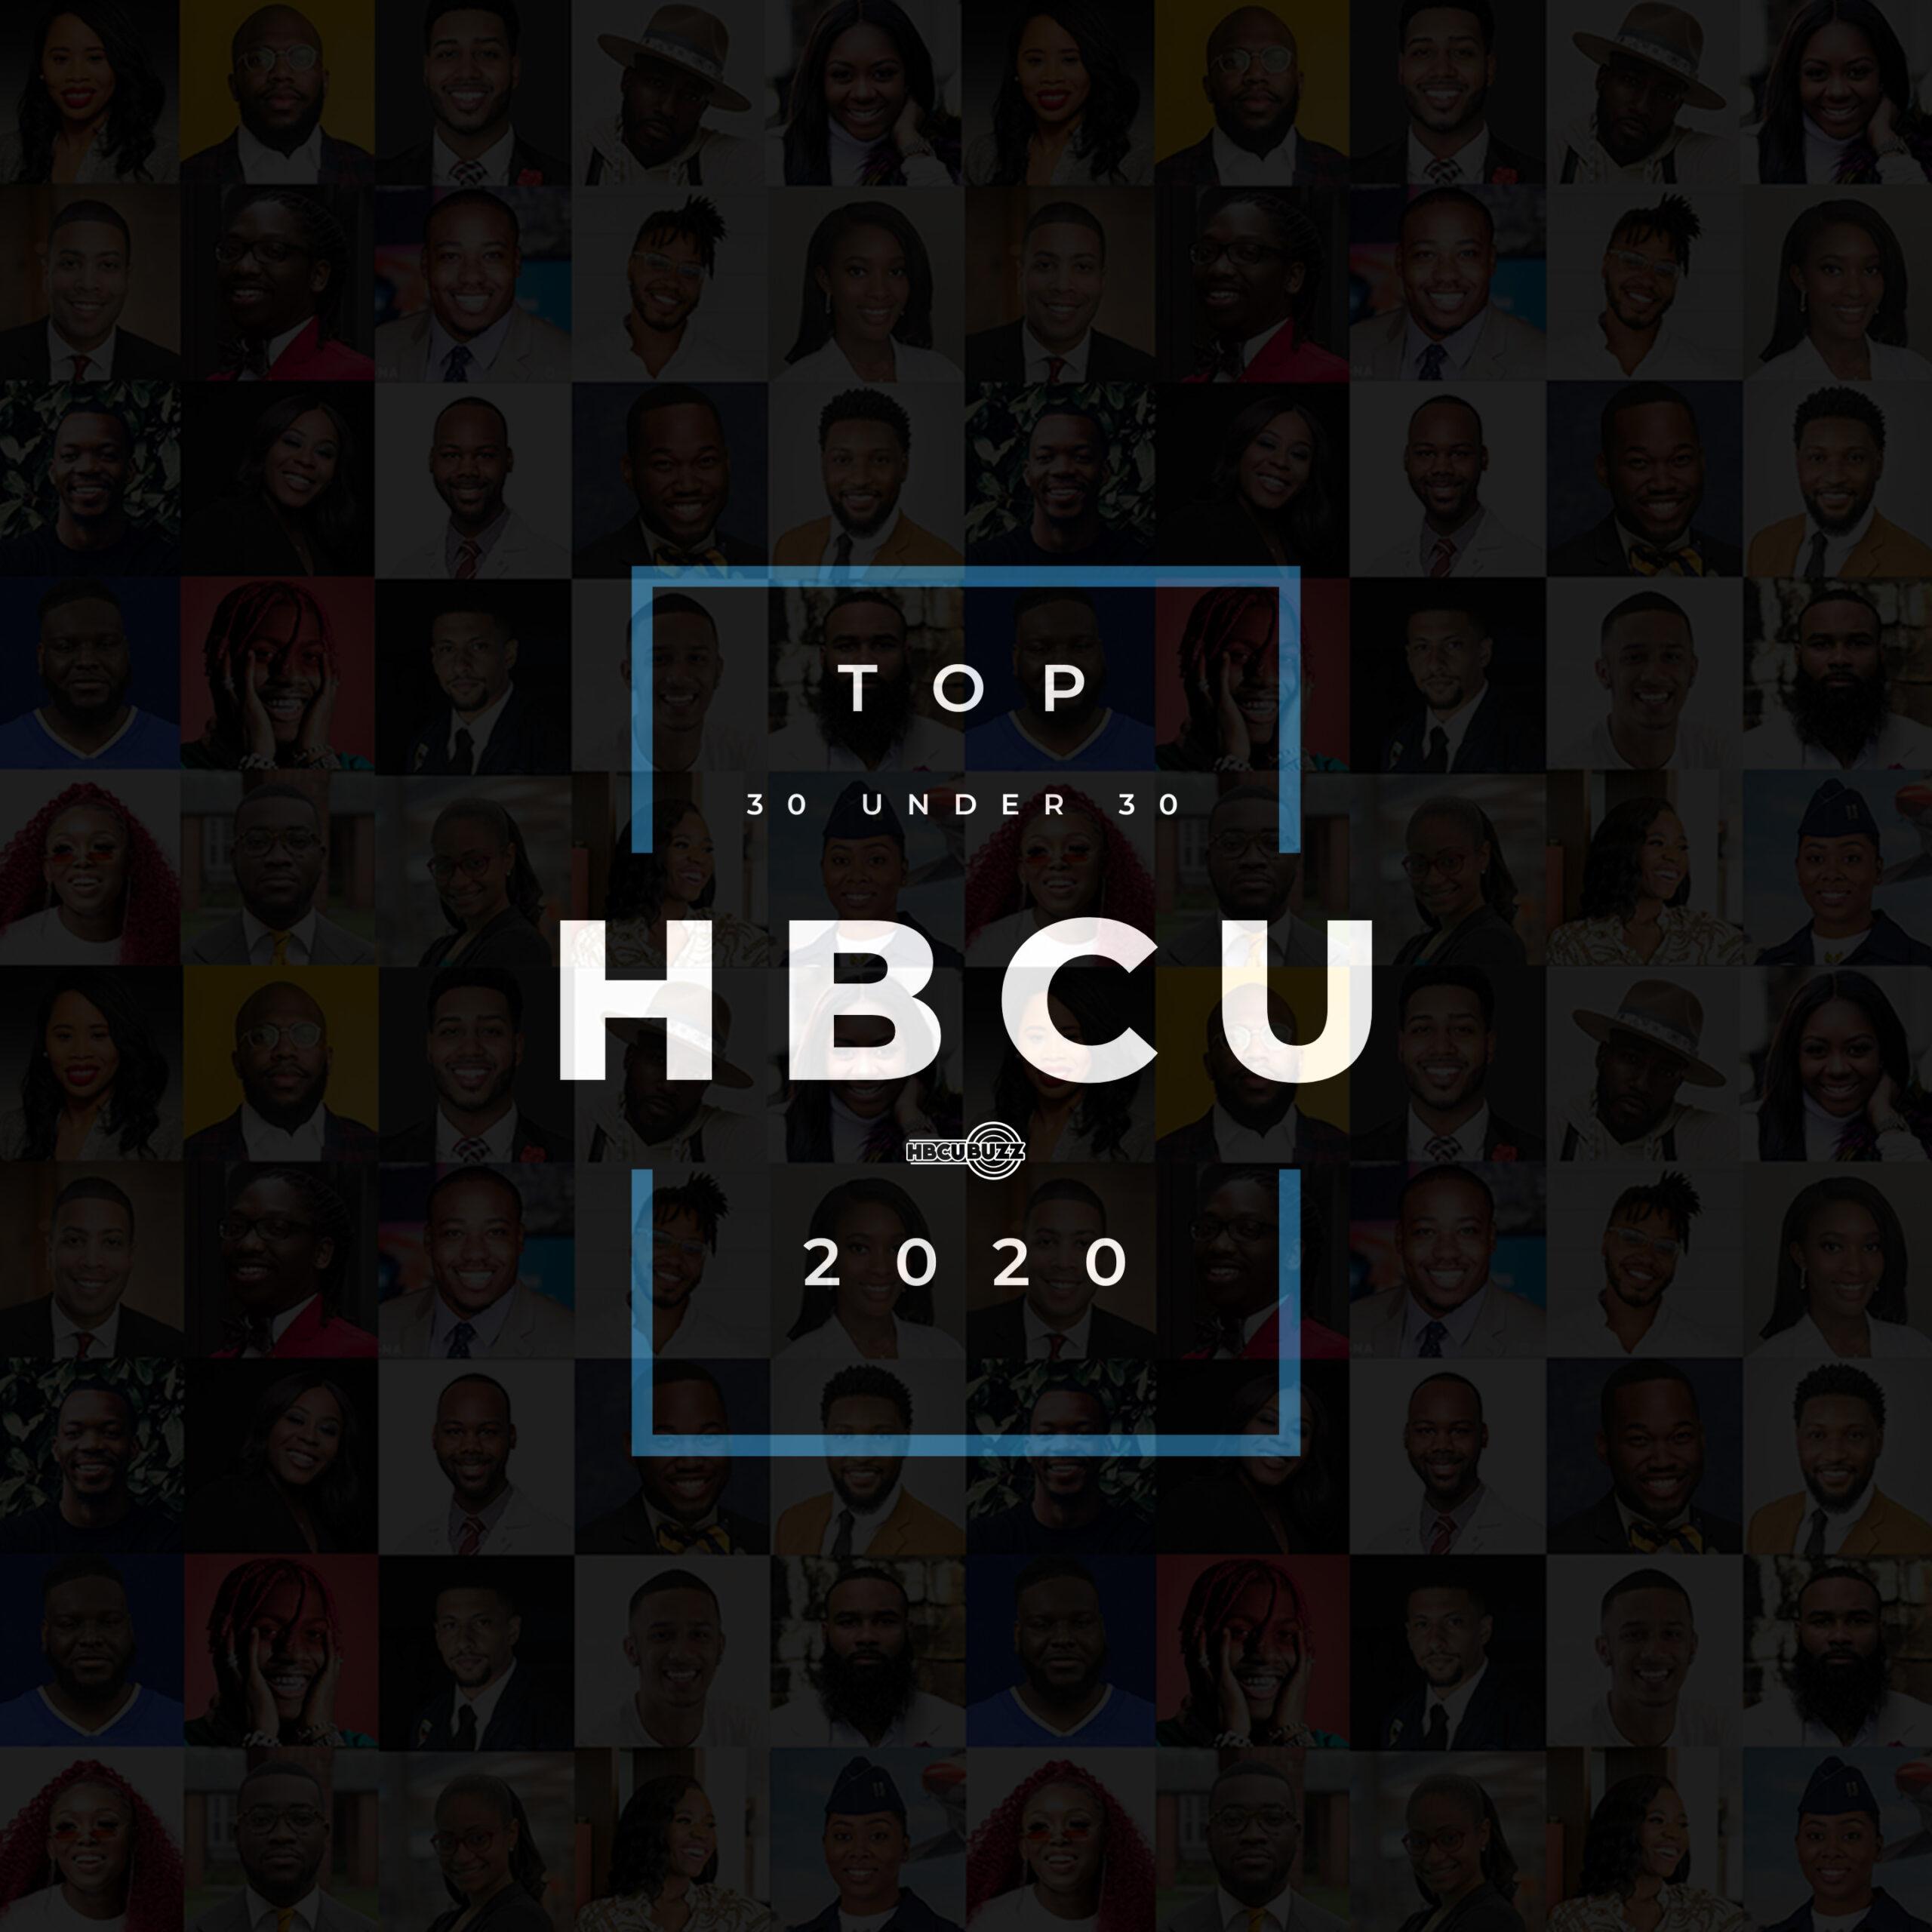 HBCU Top 30 Under 30 2020